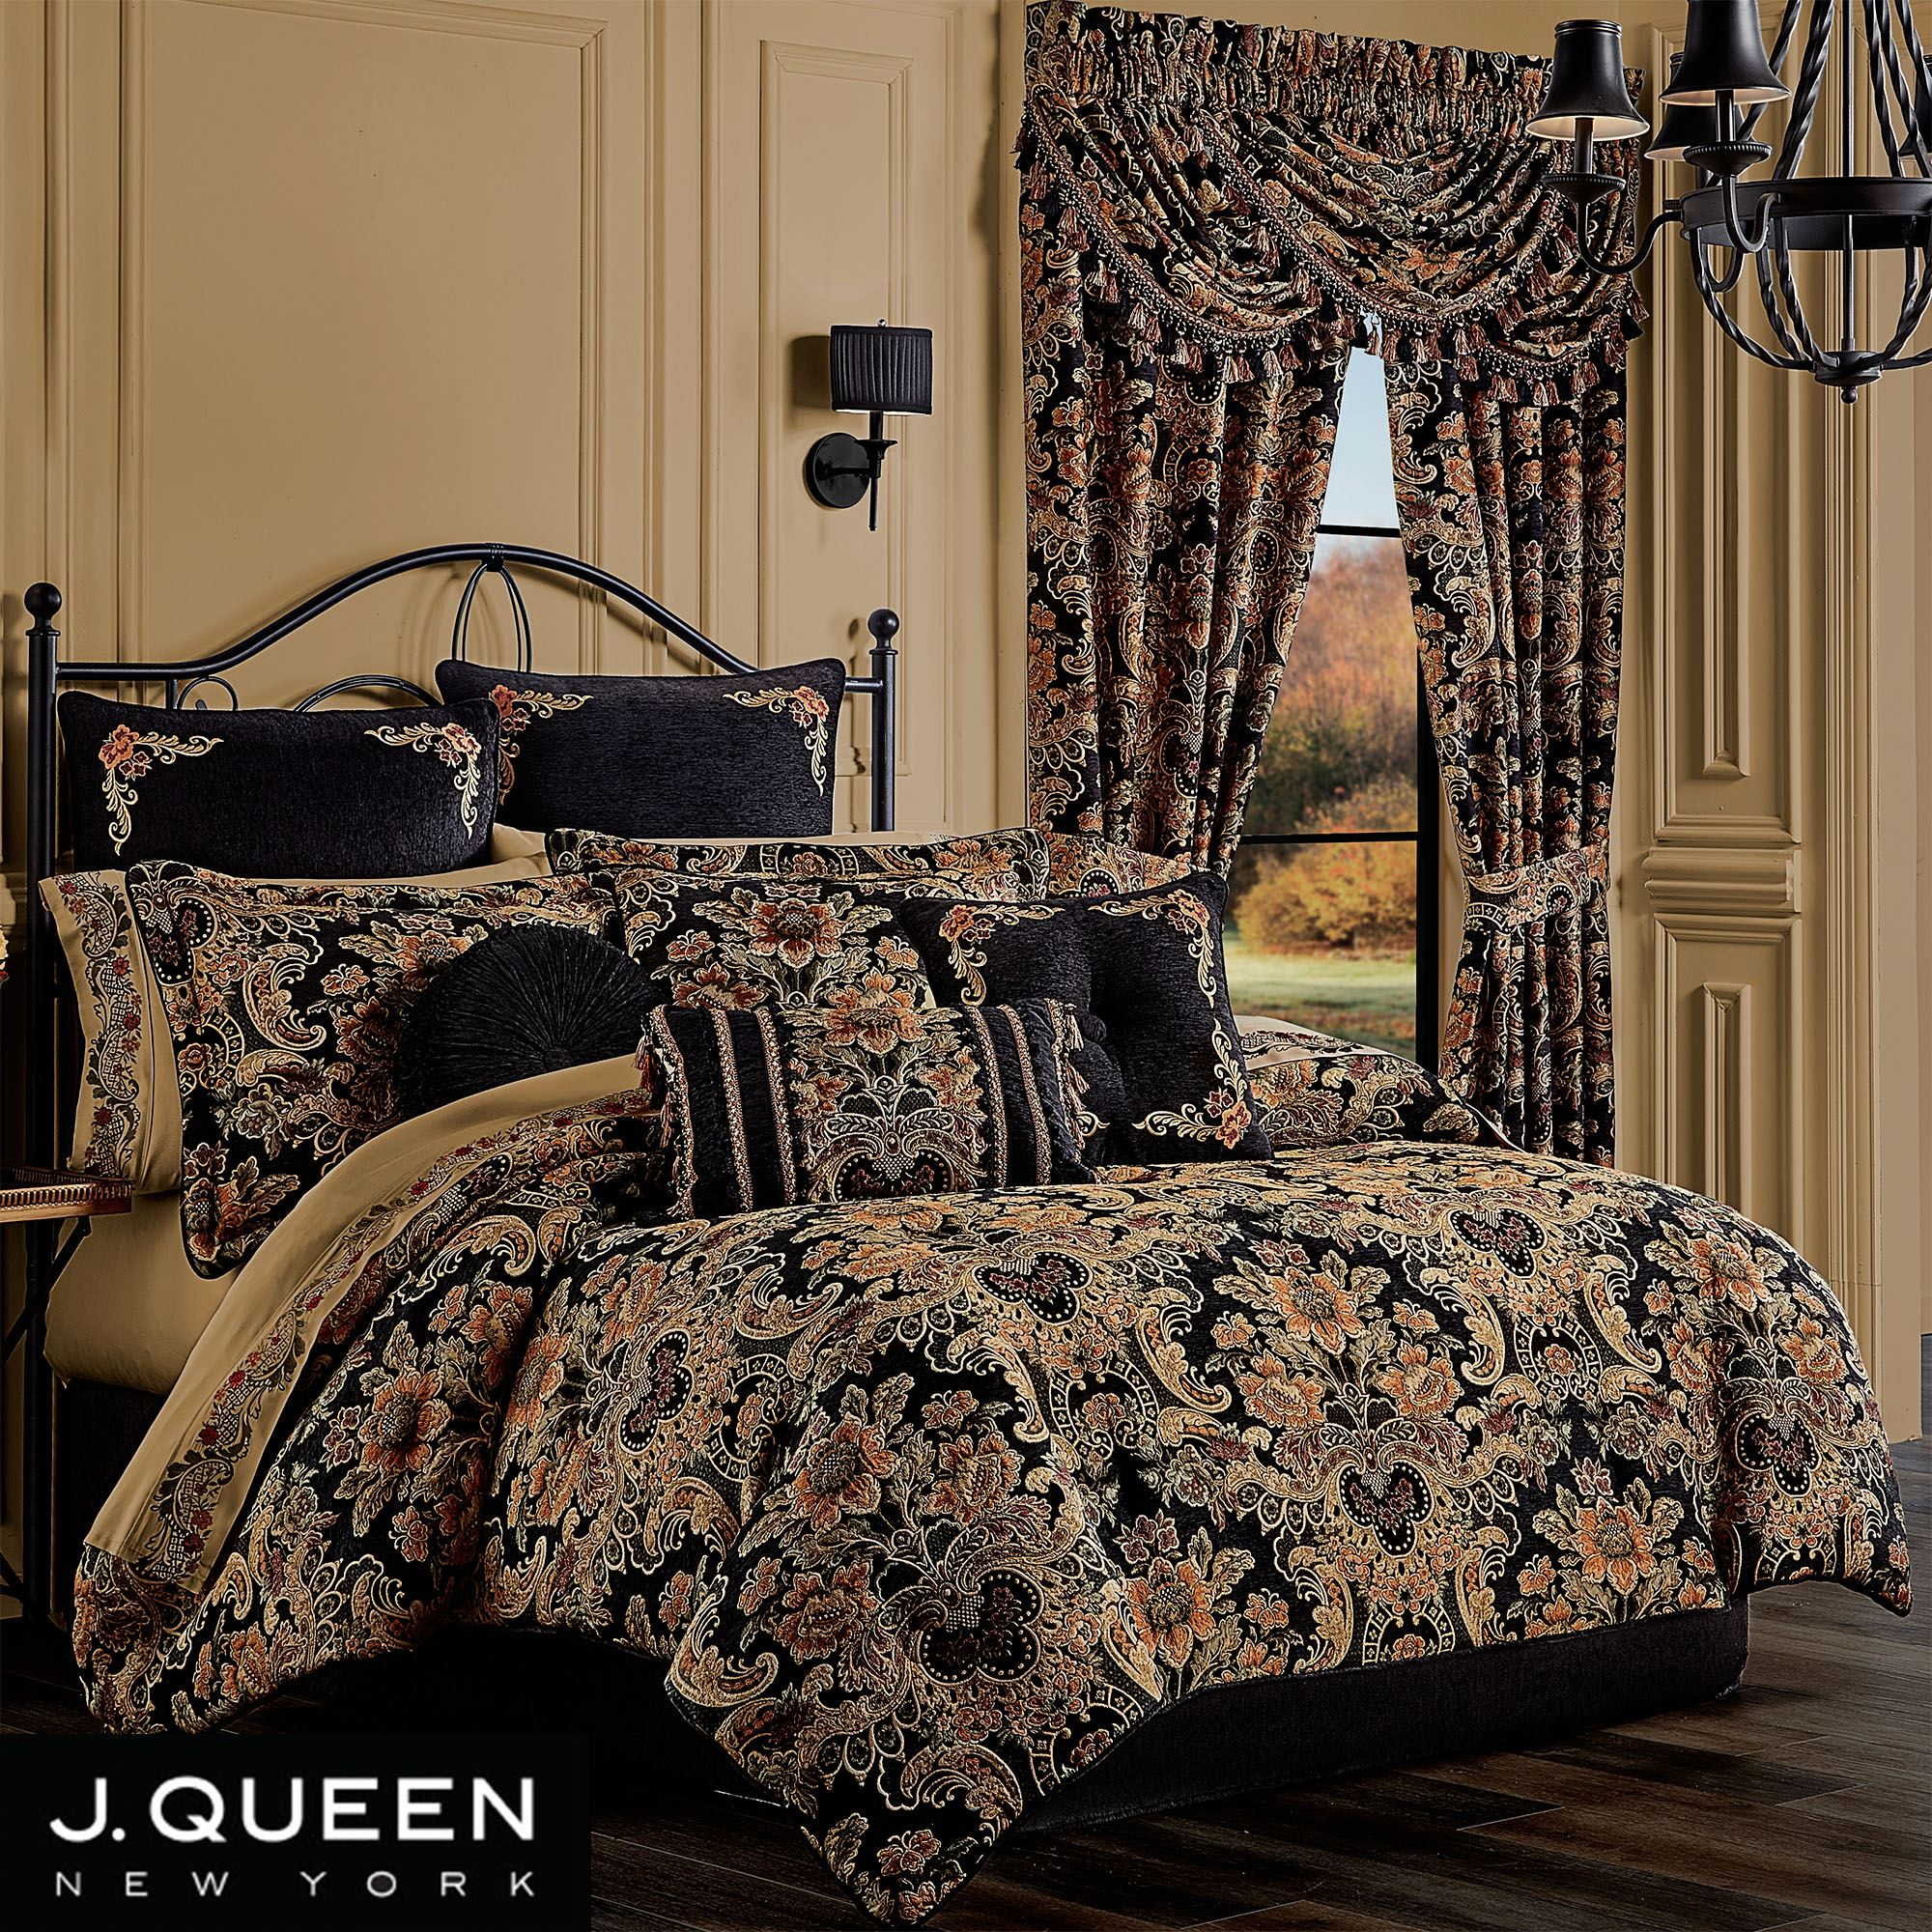 Toscano Black Jacobean Damask Comforter Set Bedding By J Queen New York